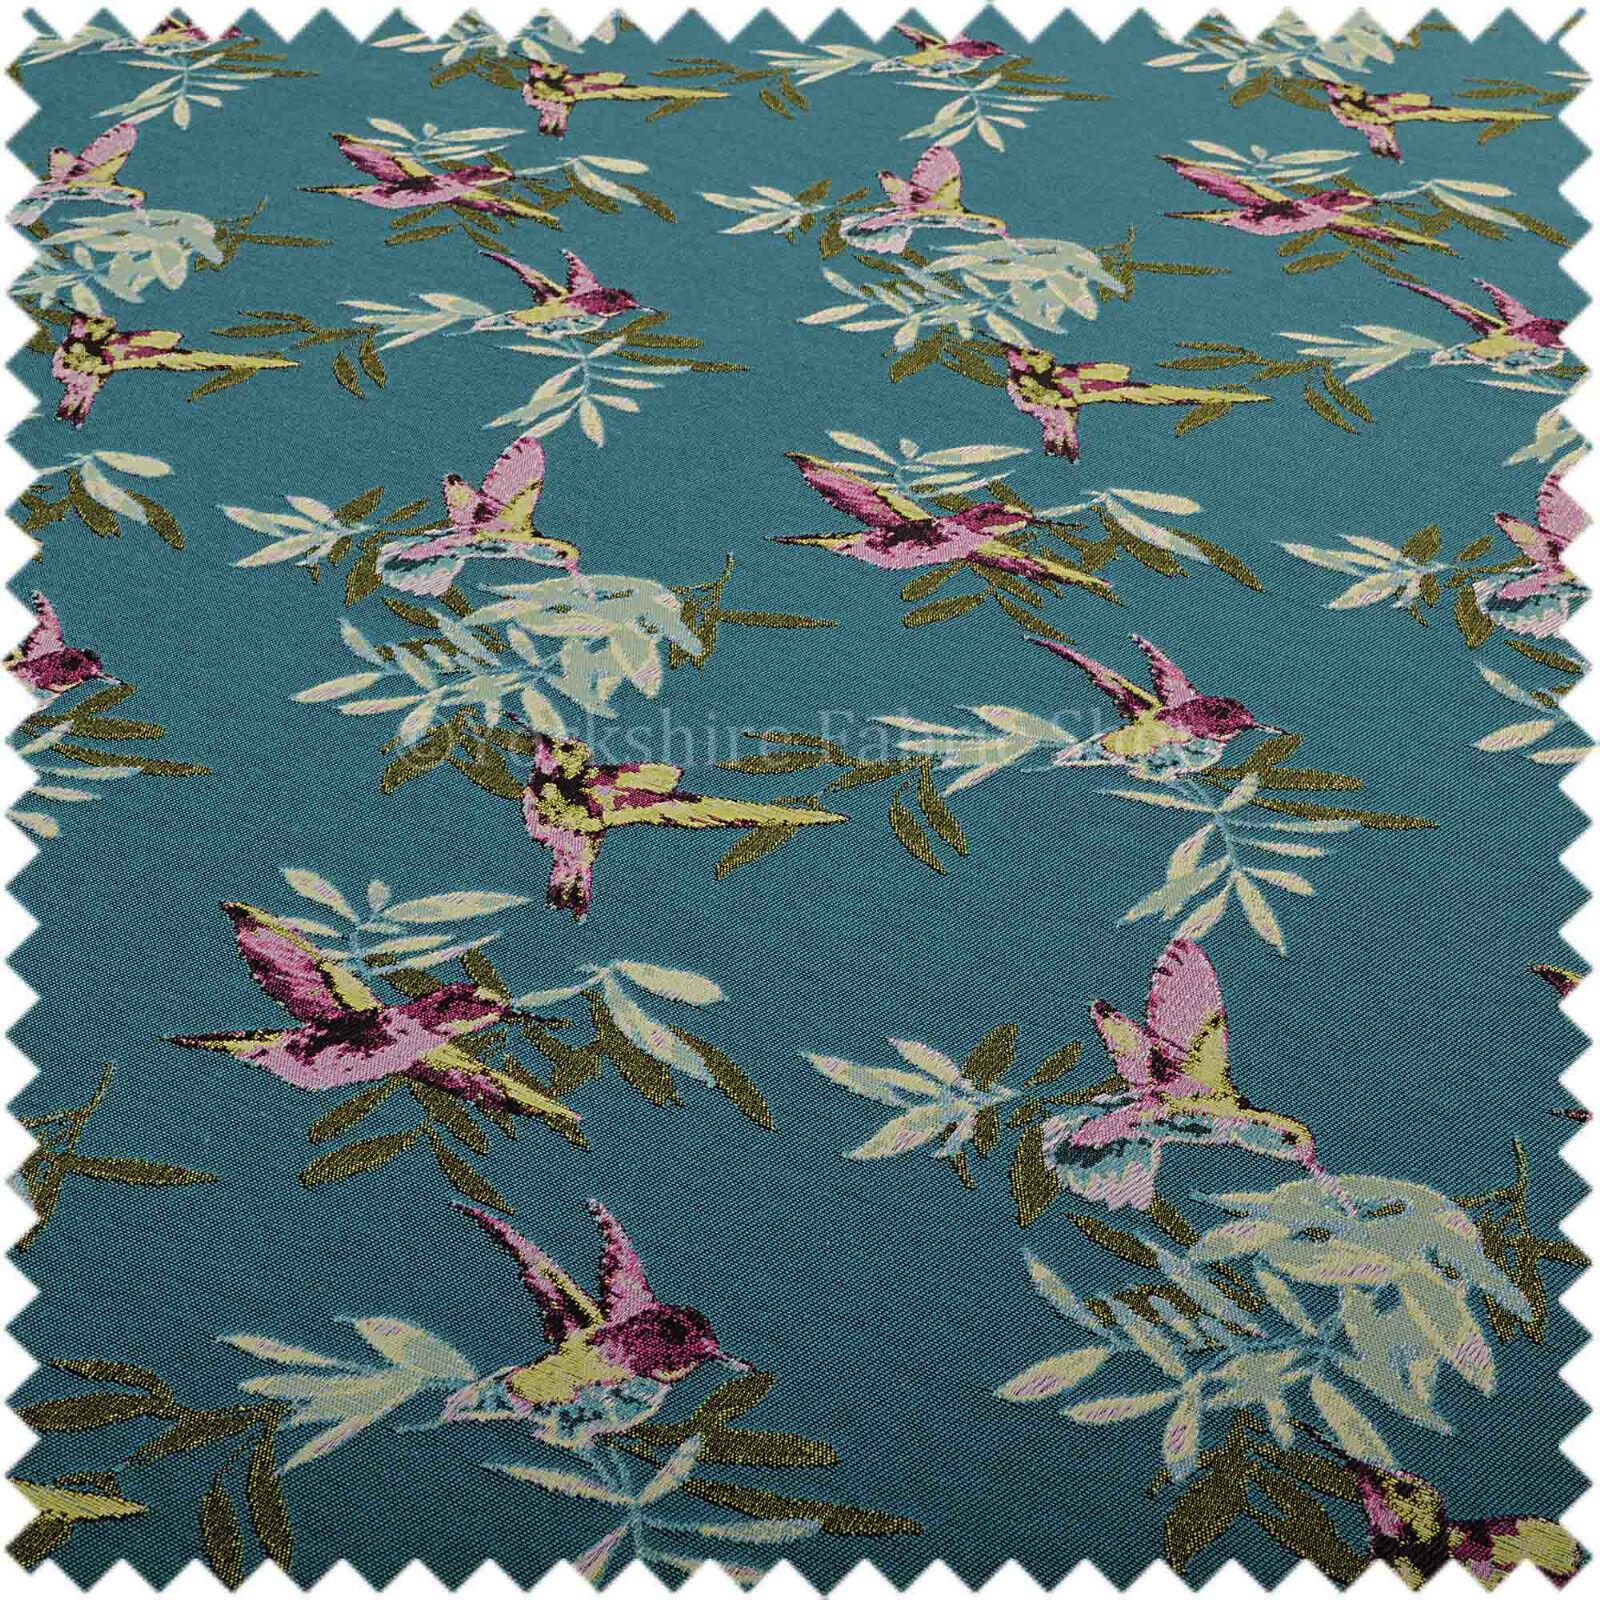 Green Kingfisher Ecosia